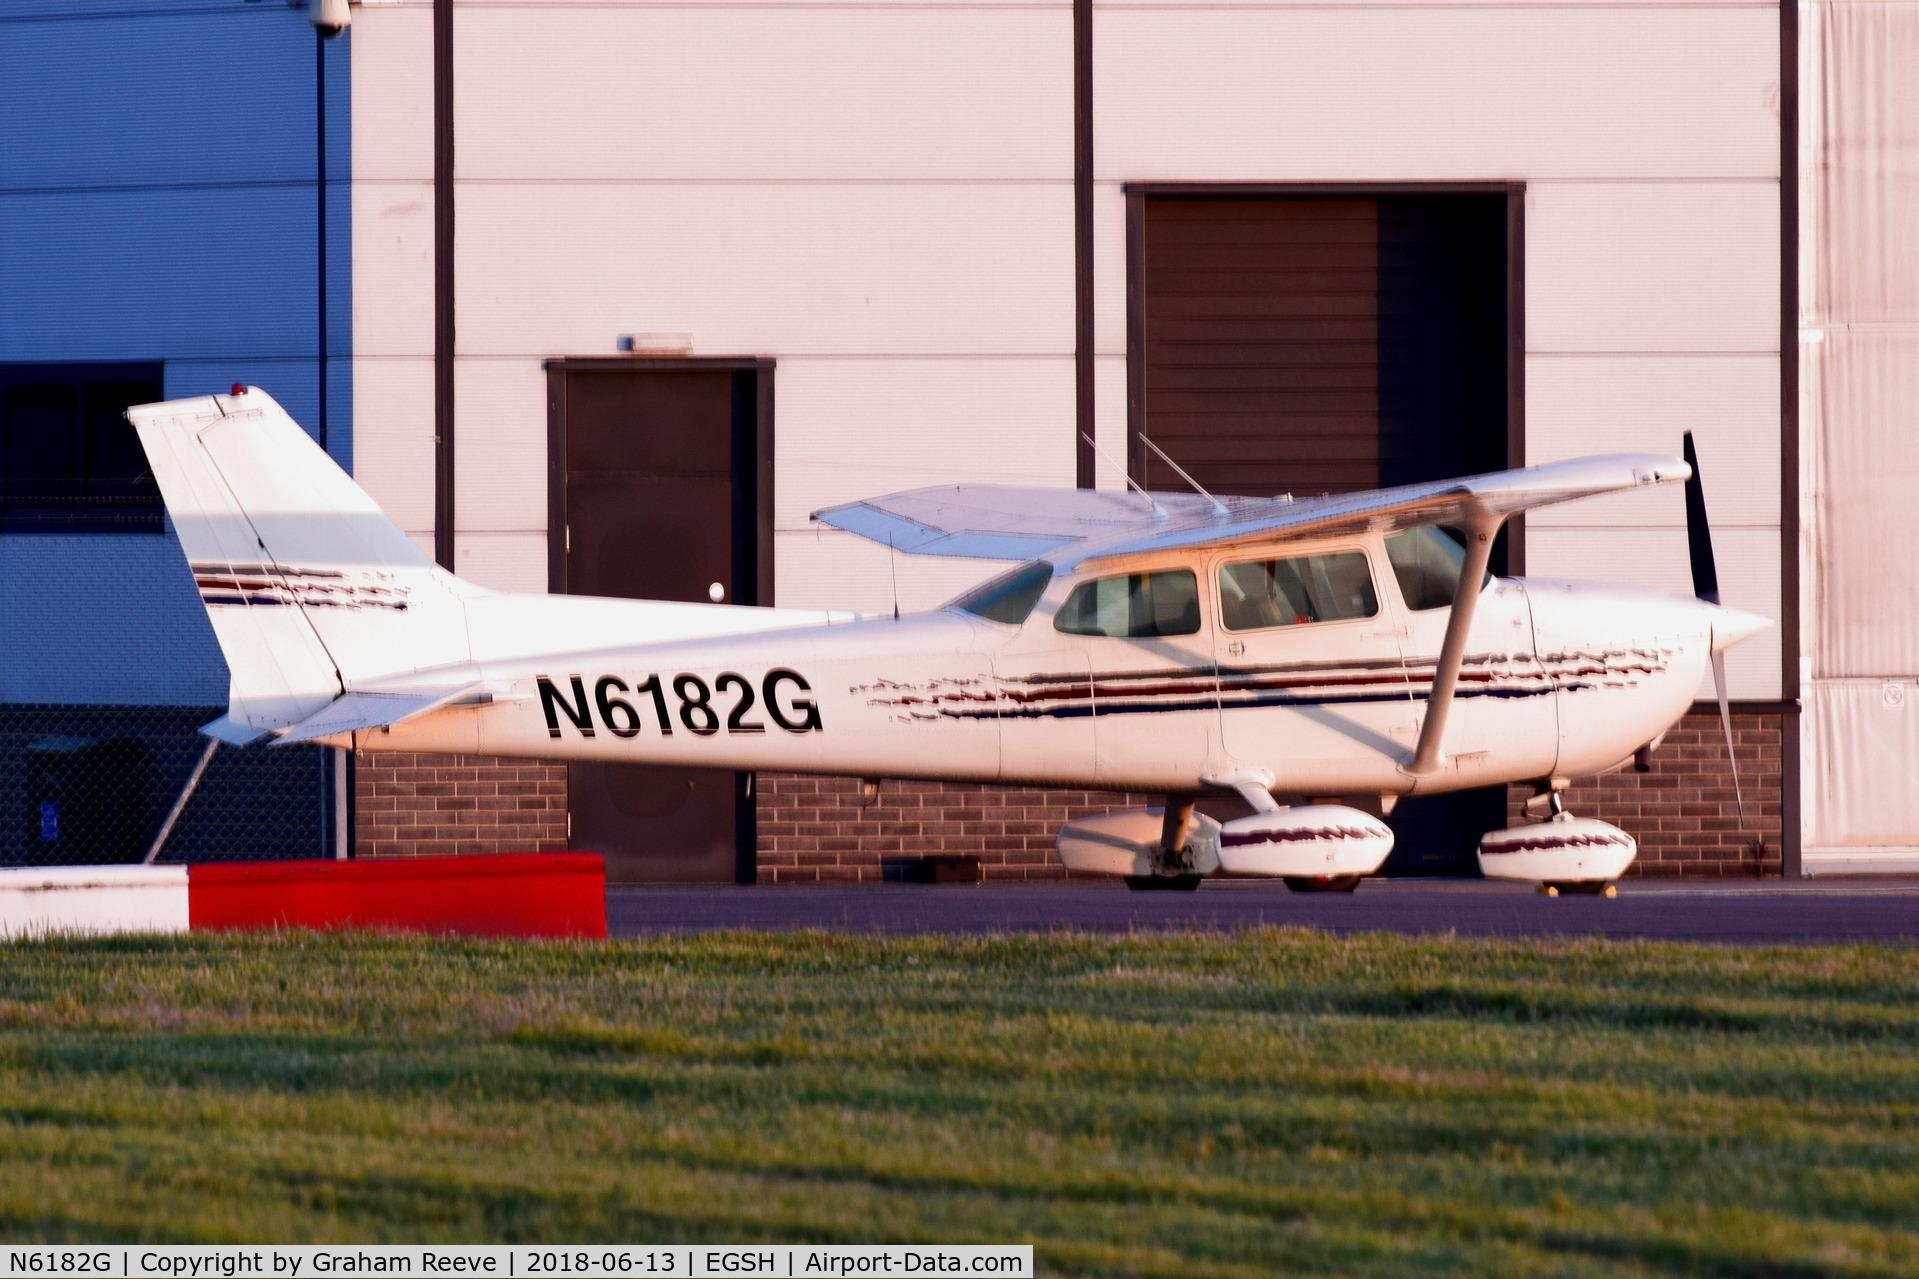 N6182G, 1979 Cessna 172N Skyhawk C/N 17273576, Parked at Norwich.